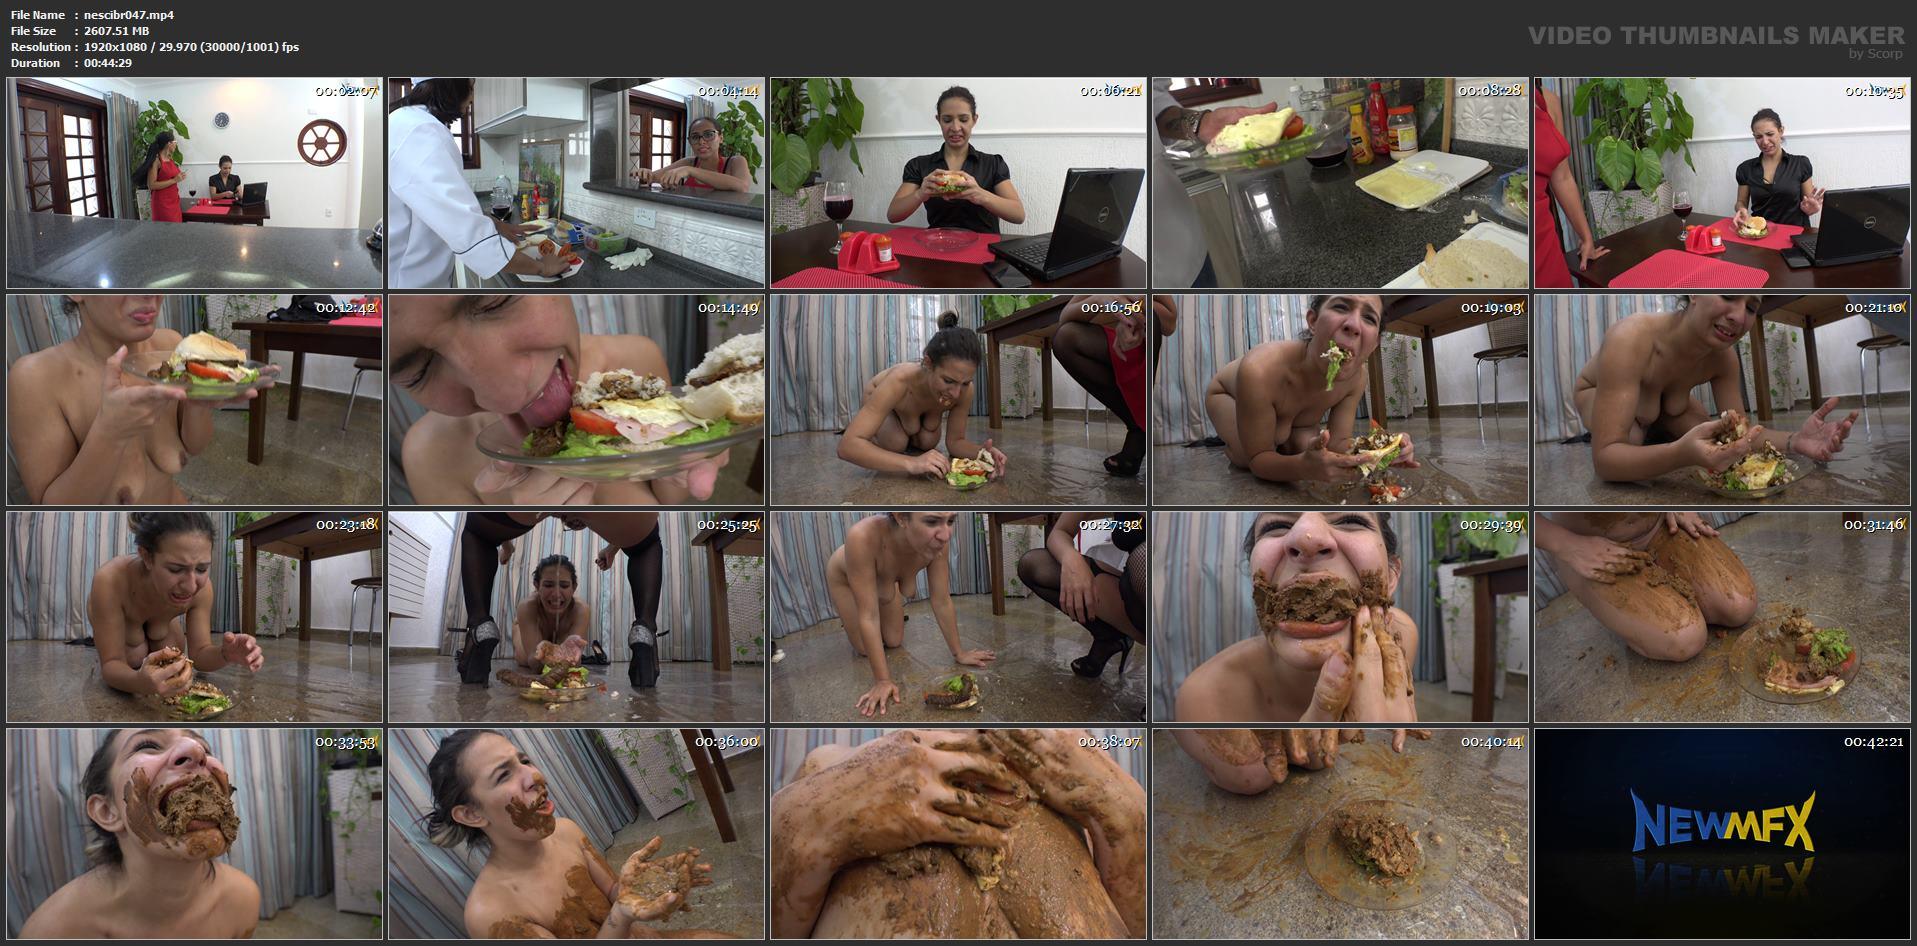 [NEW SCAT IN BRAZIL / NEWMFX] SHIT SANDWICH. Featuring: Alana, Bianca Santos, Saori Kido [FULL HD][1080p][MP4]